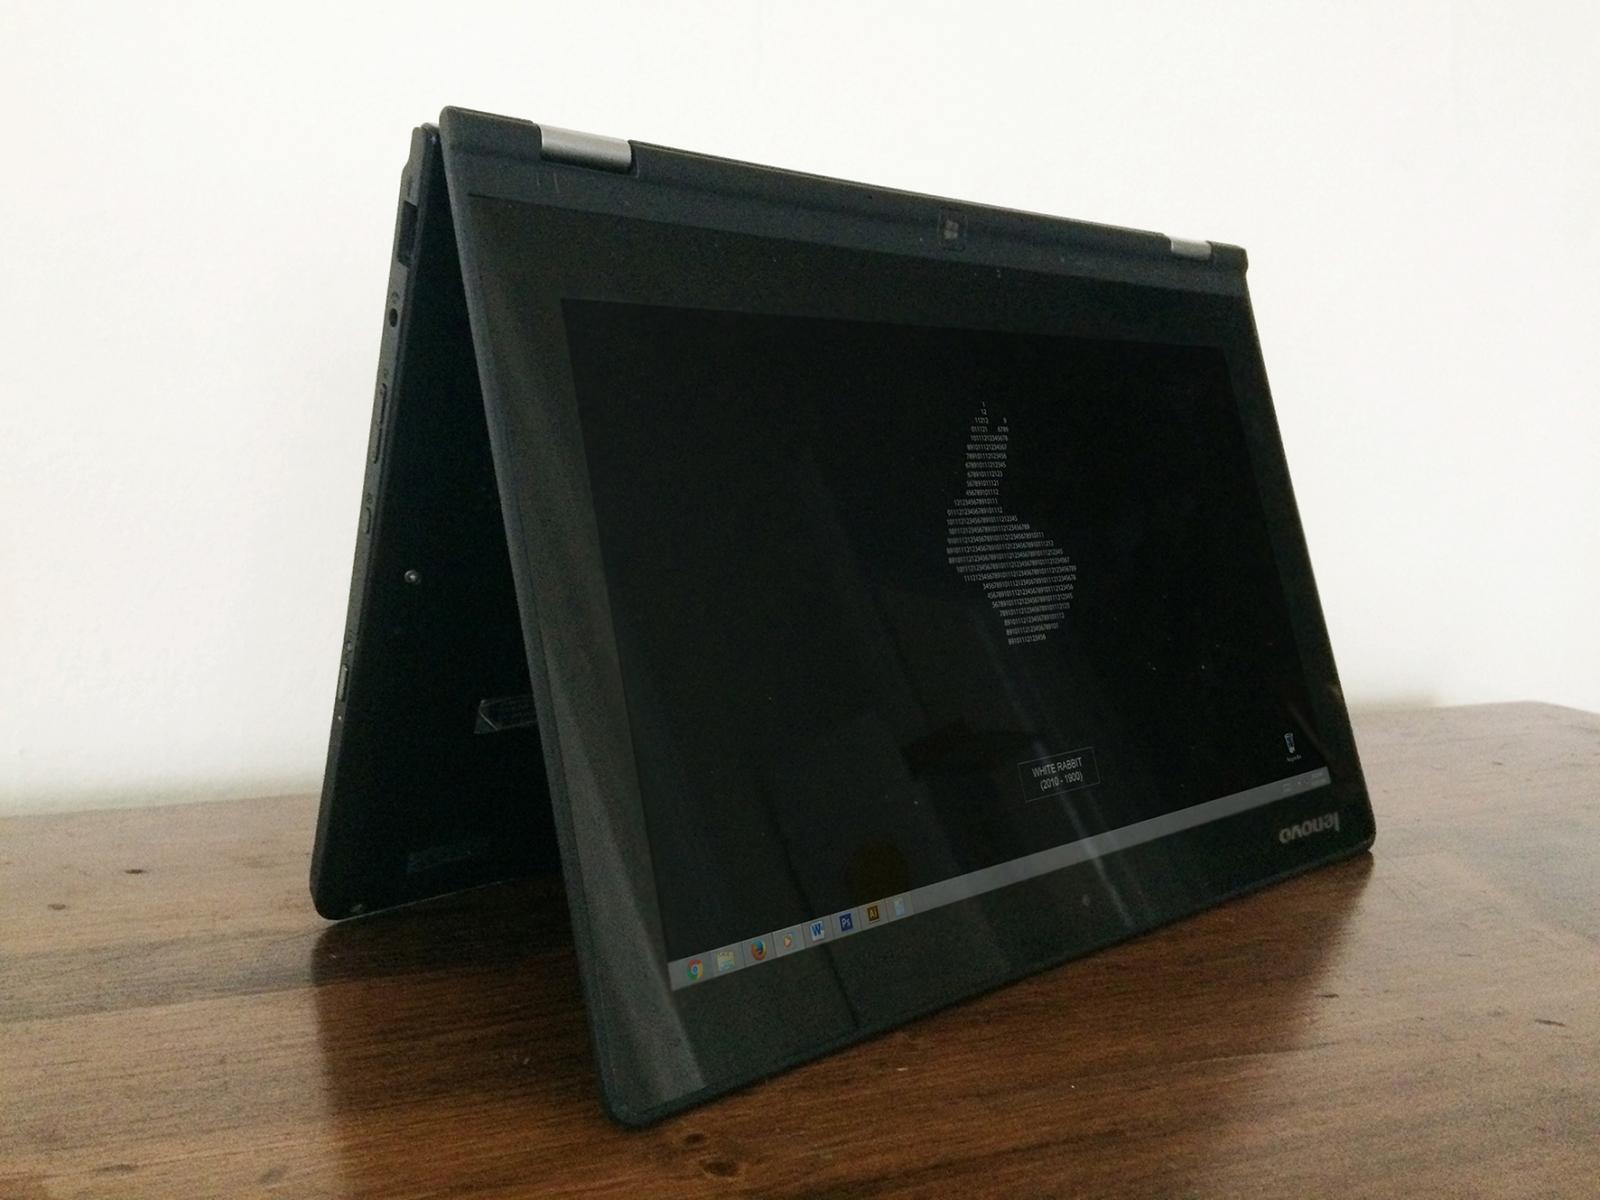 2.-White-Rabbit-2010-Virus-Installation-Process-Art-Naivy-Perez